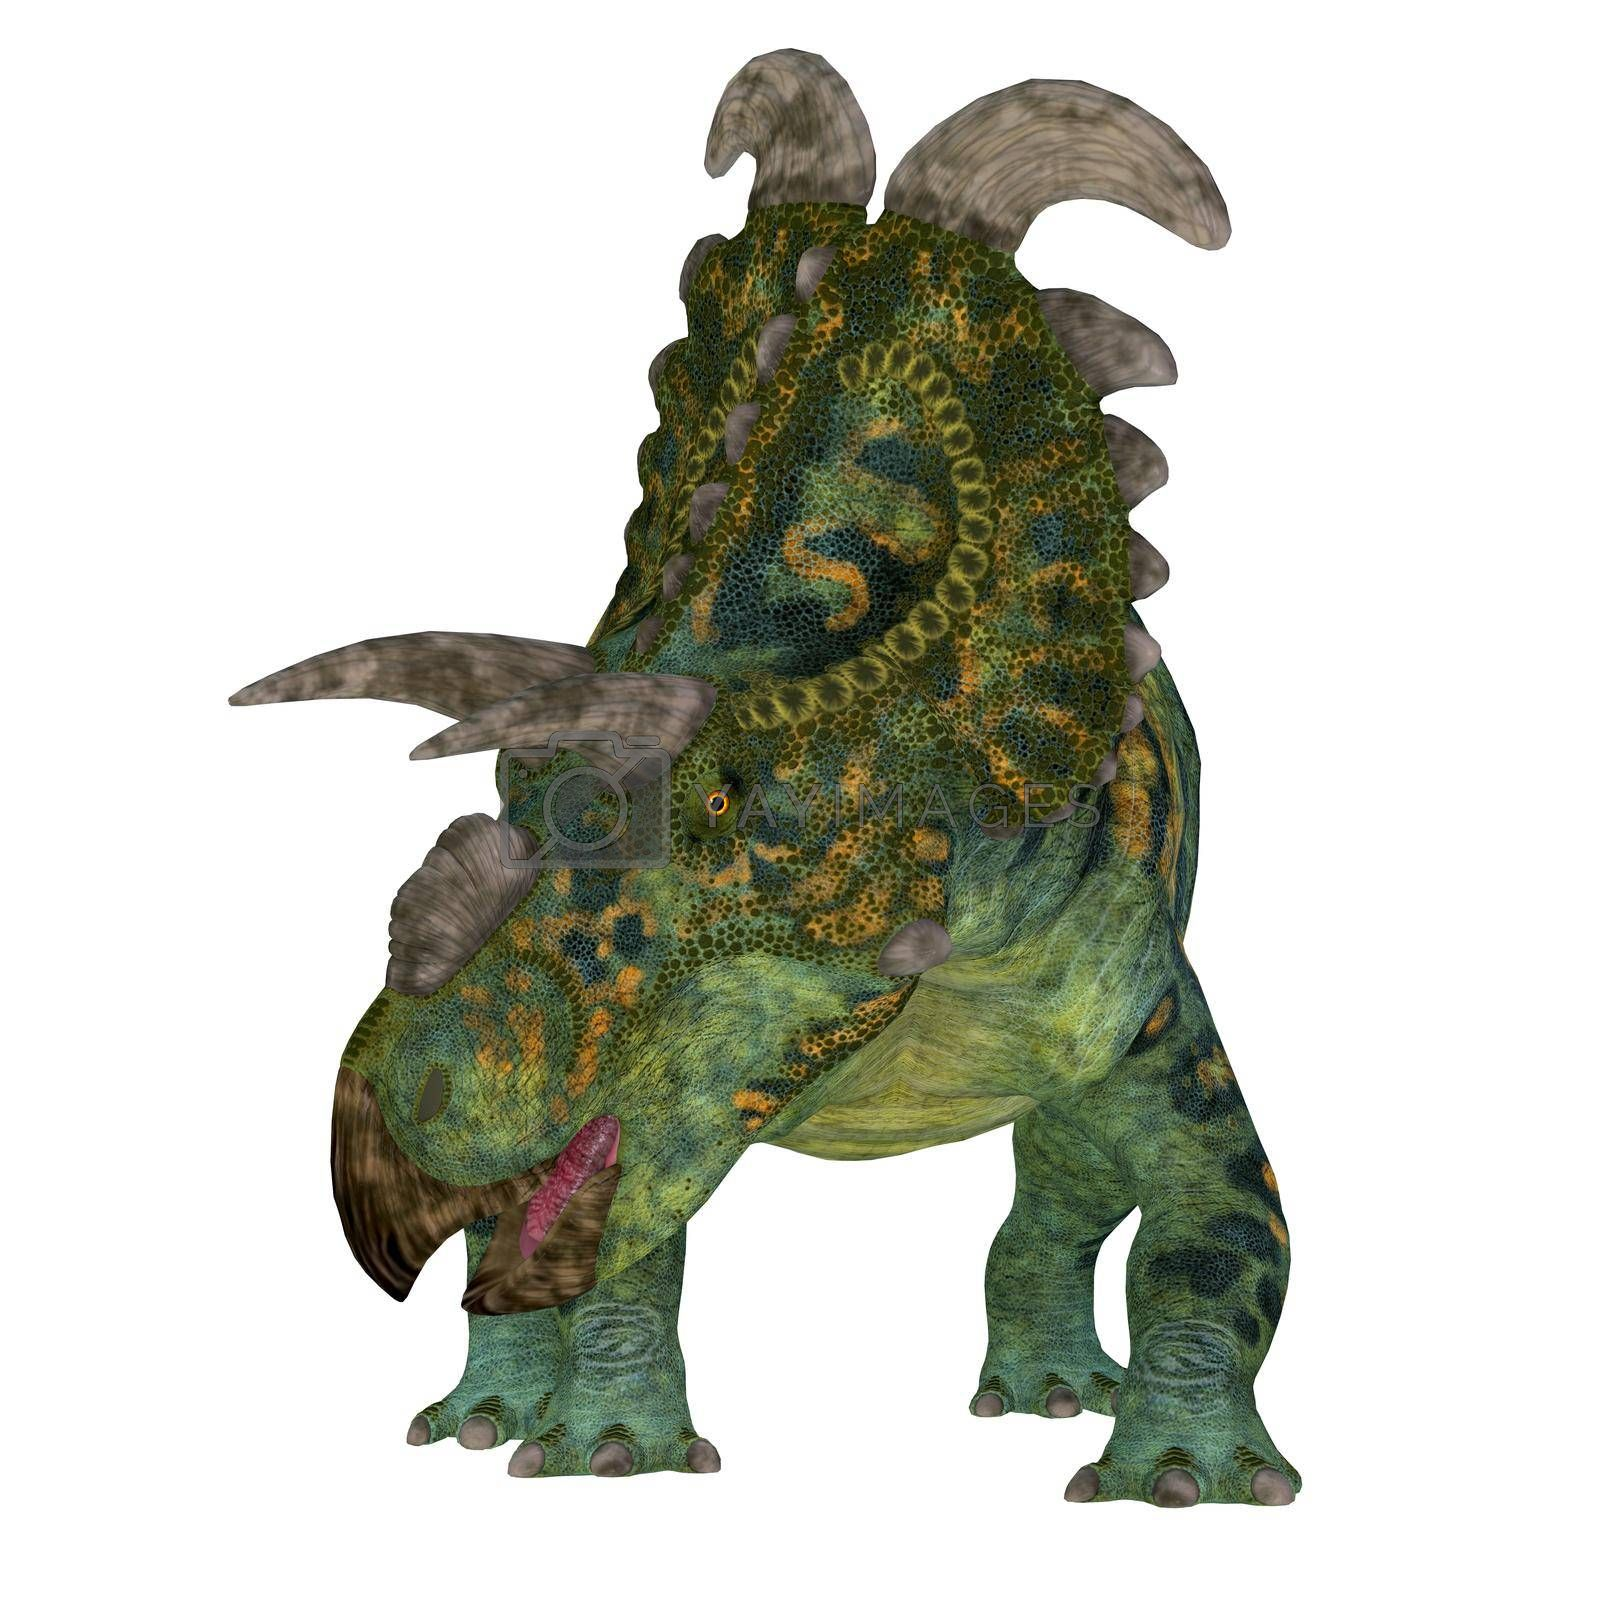 The Ceratopsian herbivorous dinosaur Albertaceratops lived in Alberta, Canada during the Cretaceous Period.